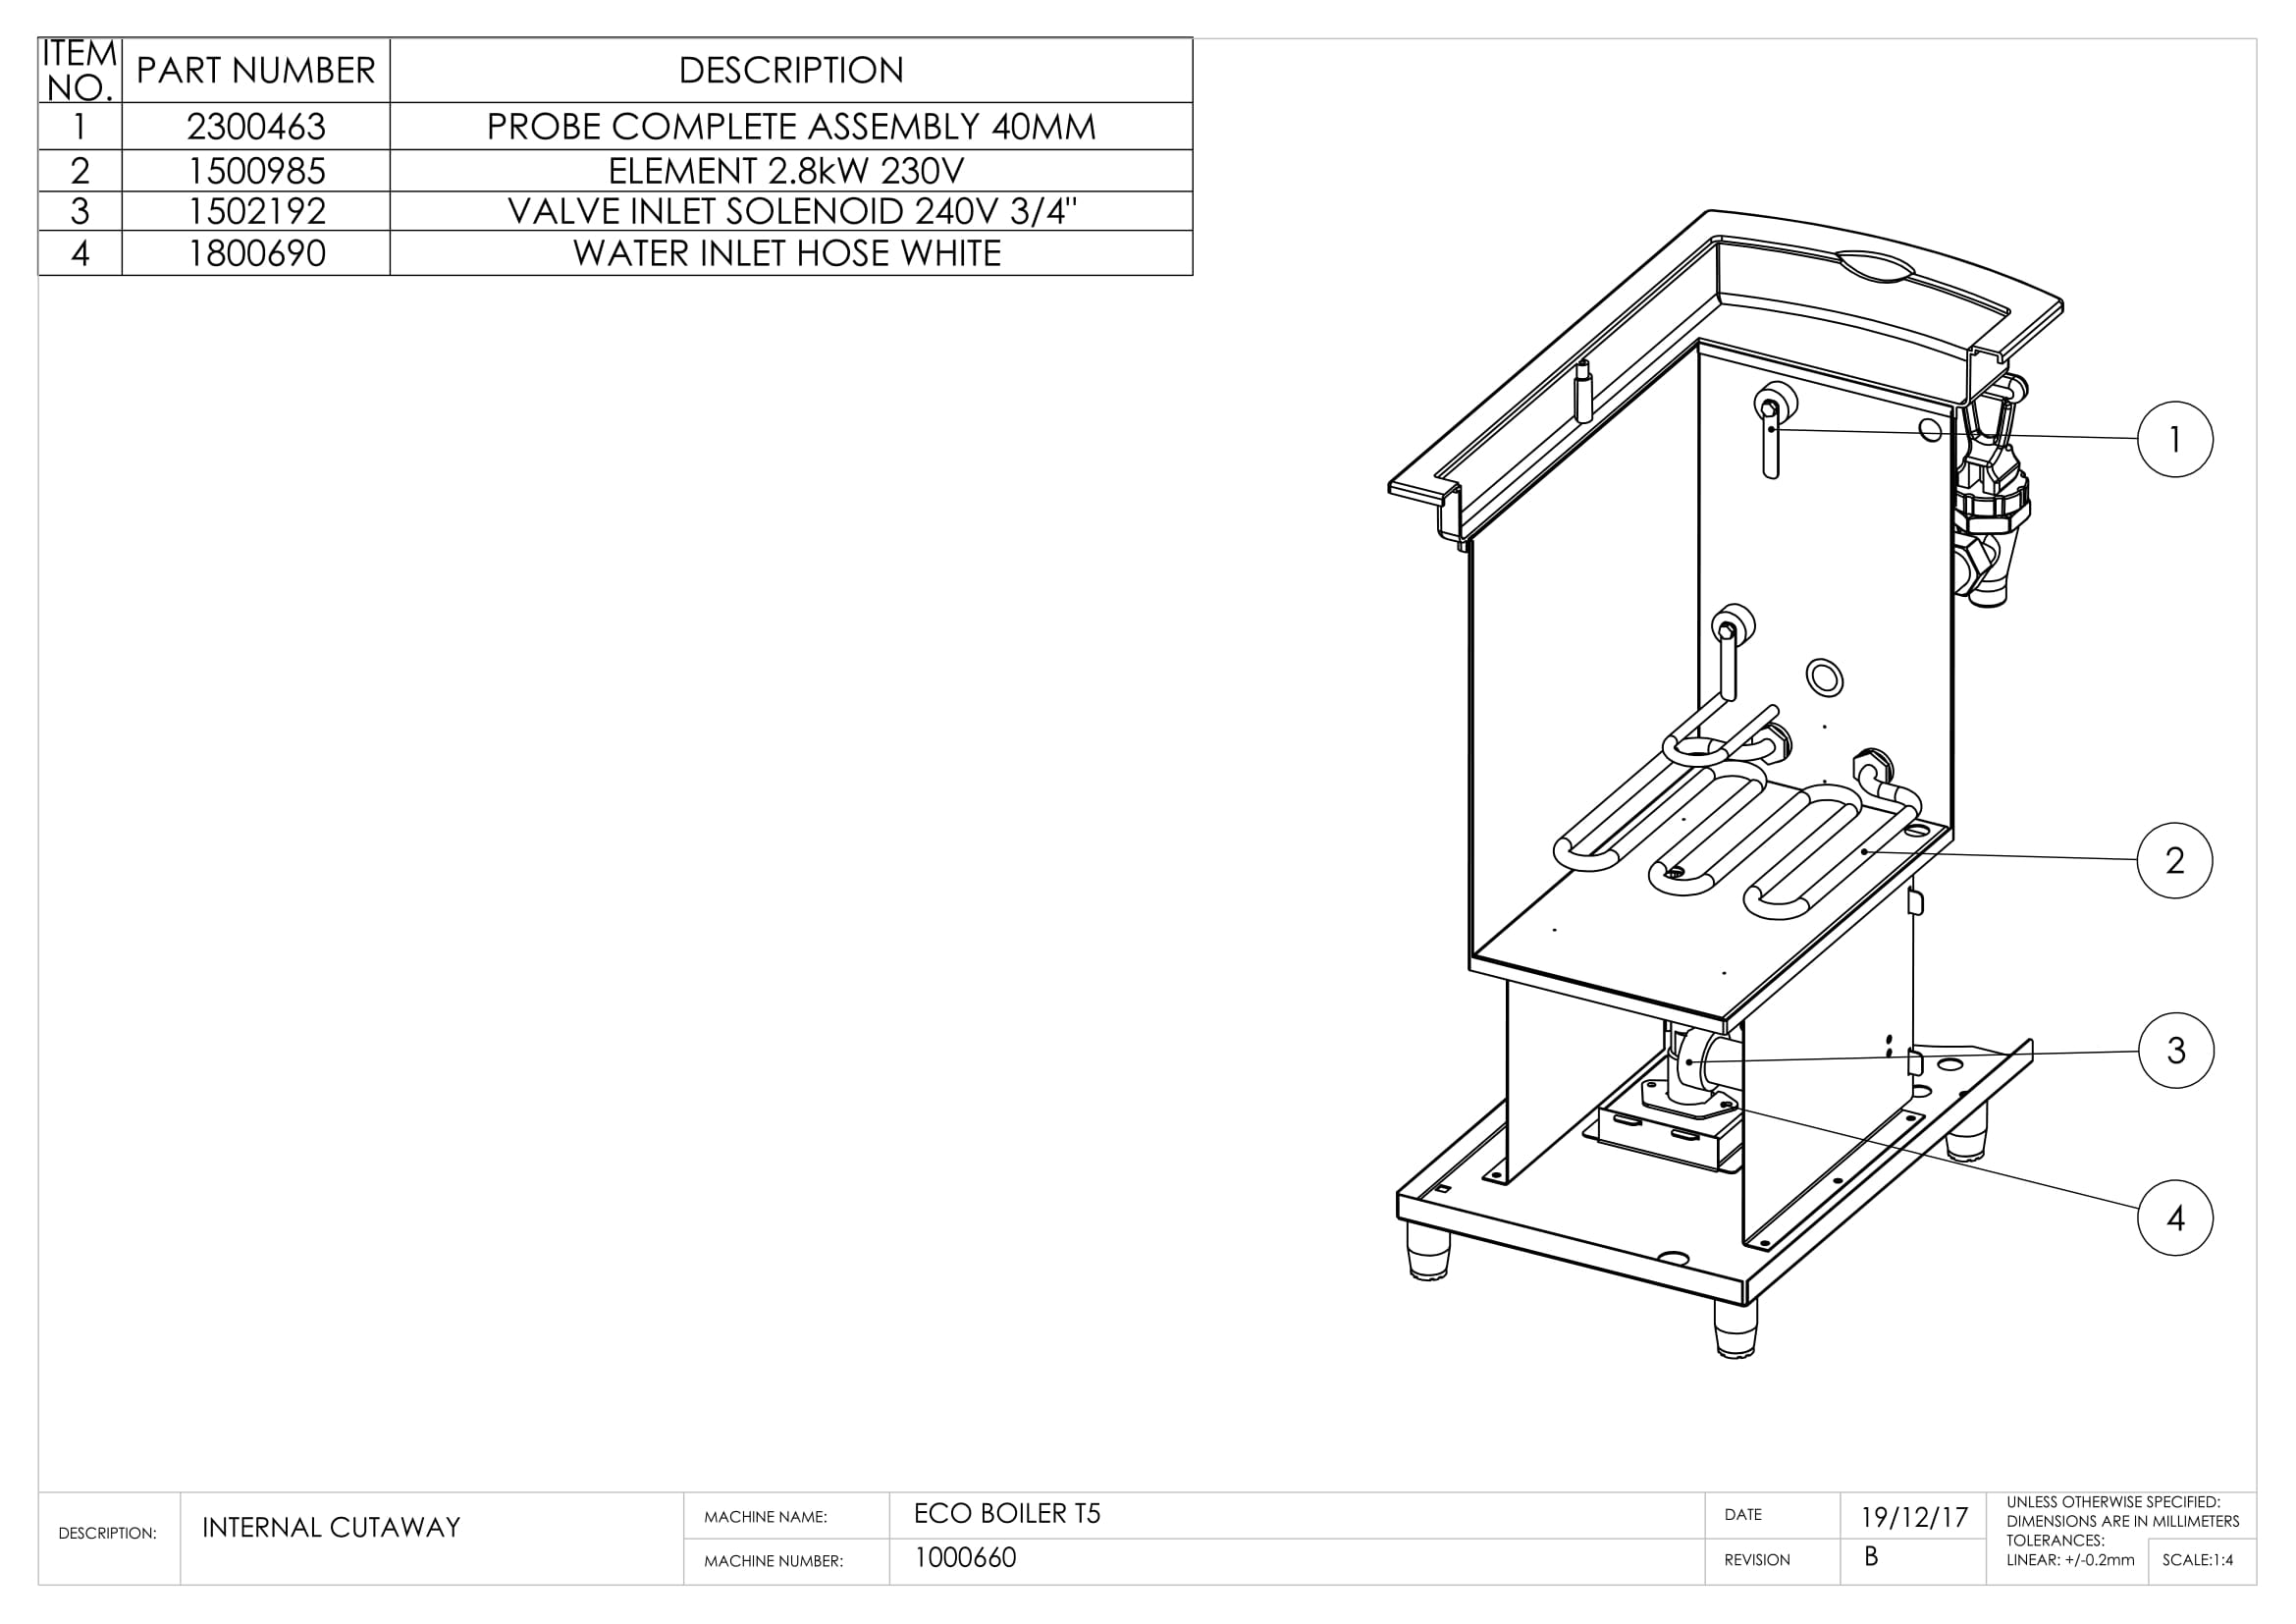 Kenwood Model Kdc Mp 445u Wiring Diagram Library. Mhd Power Plant Diagram. Wiring. Kenwood Kdc Mp445u Wiring Diagram At Scoala.co